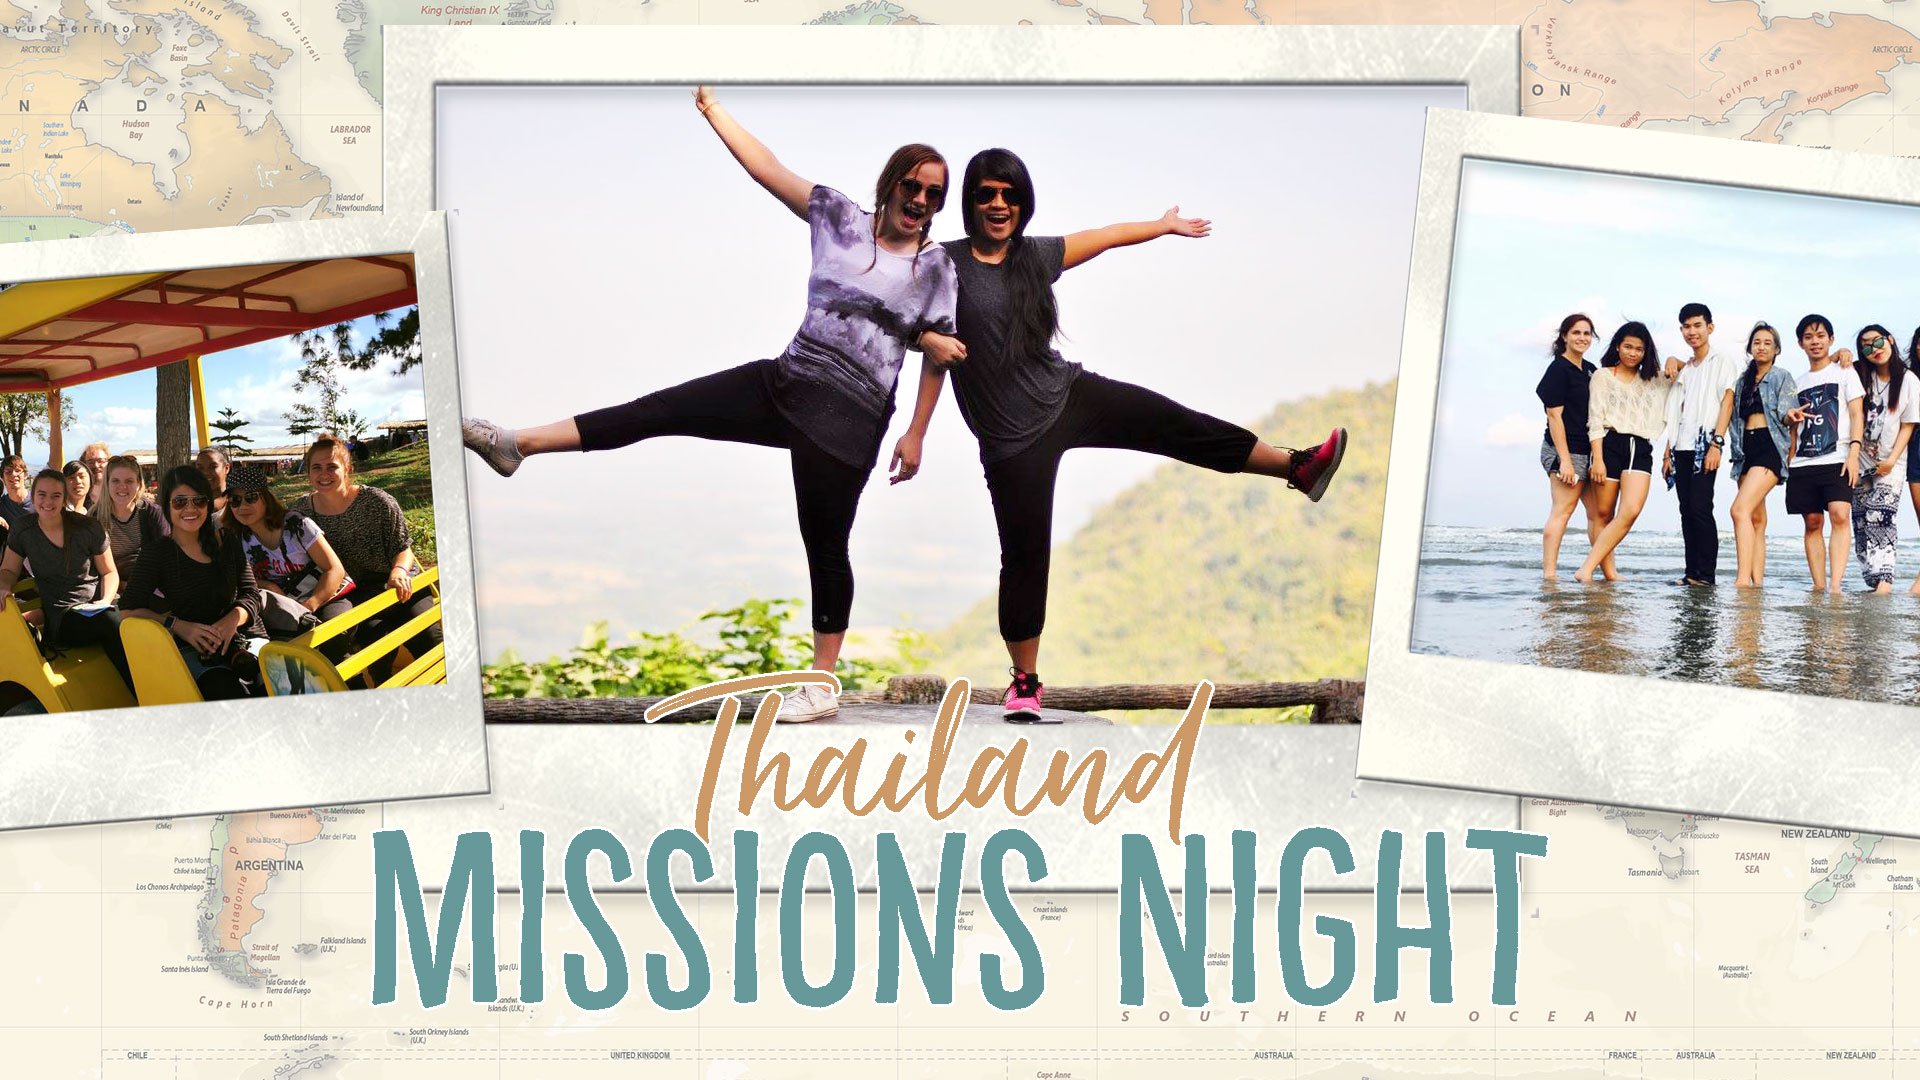 Missions Night